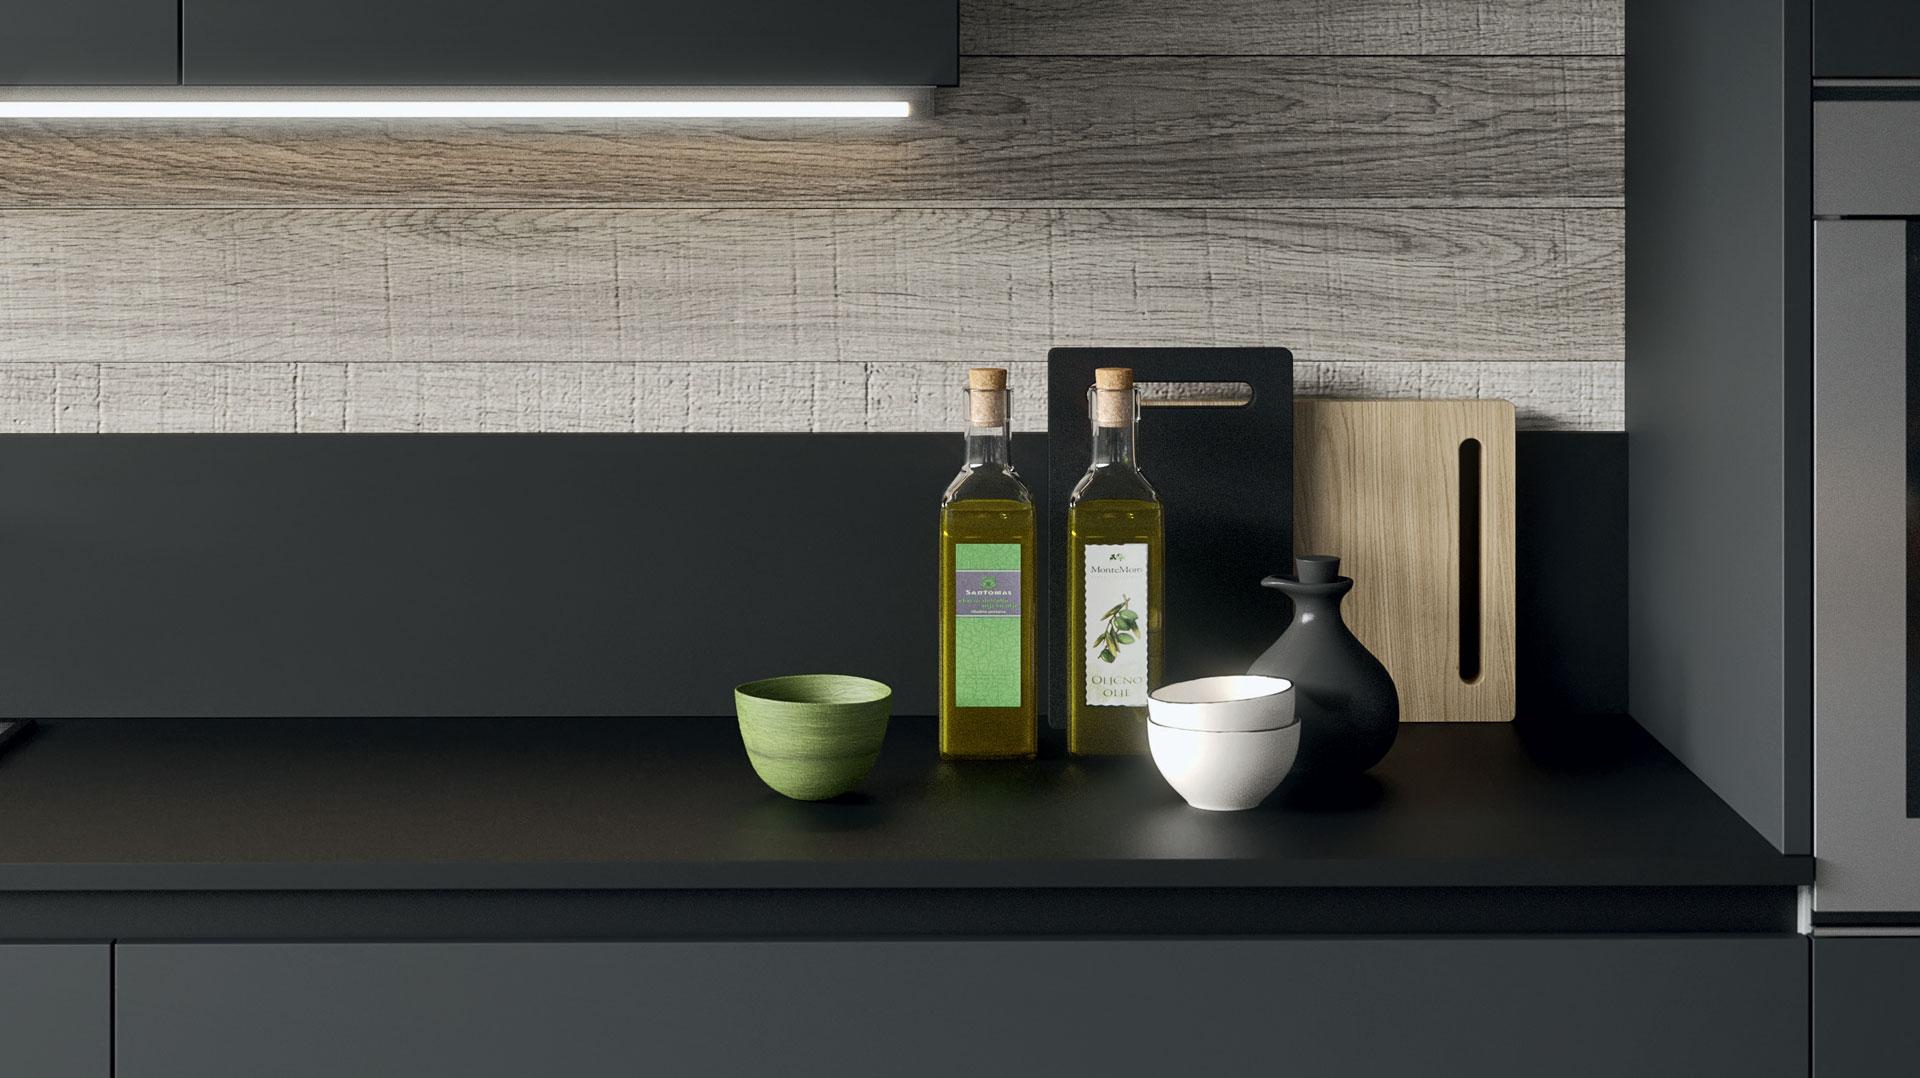 Cucine moderne de sign tecnologia ed eleganza gicinque - Top cucina fenix prezzo ...